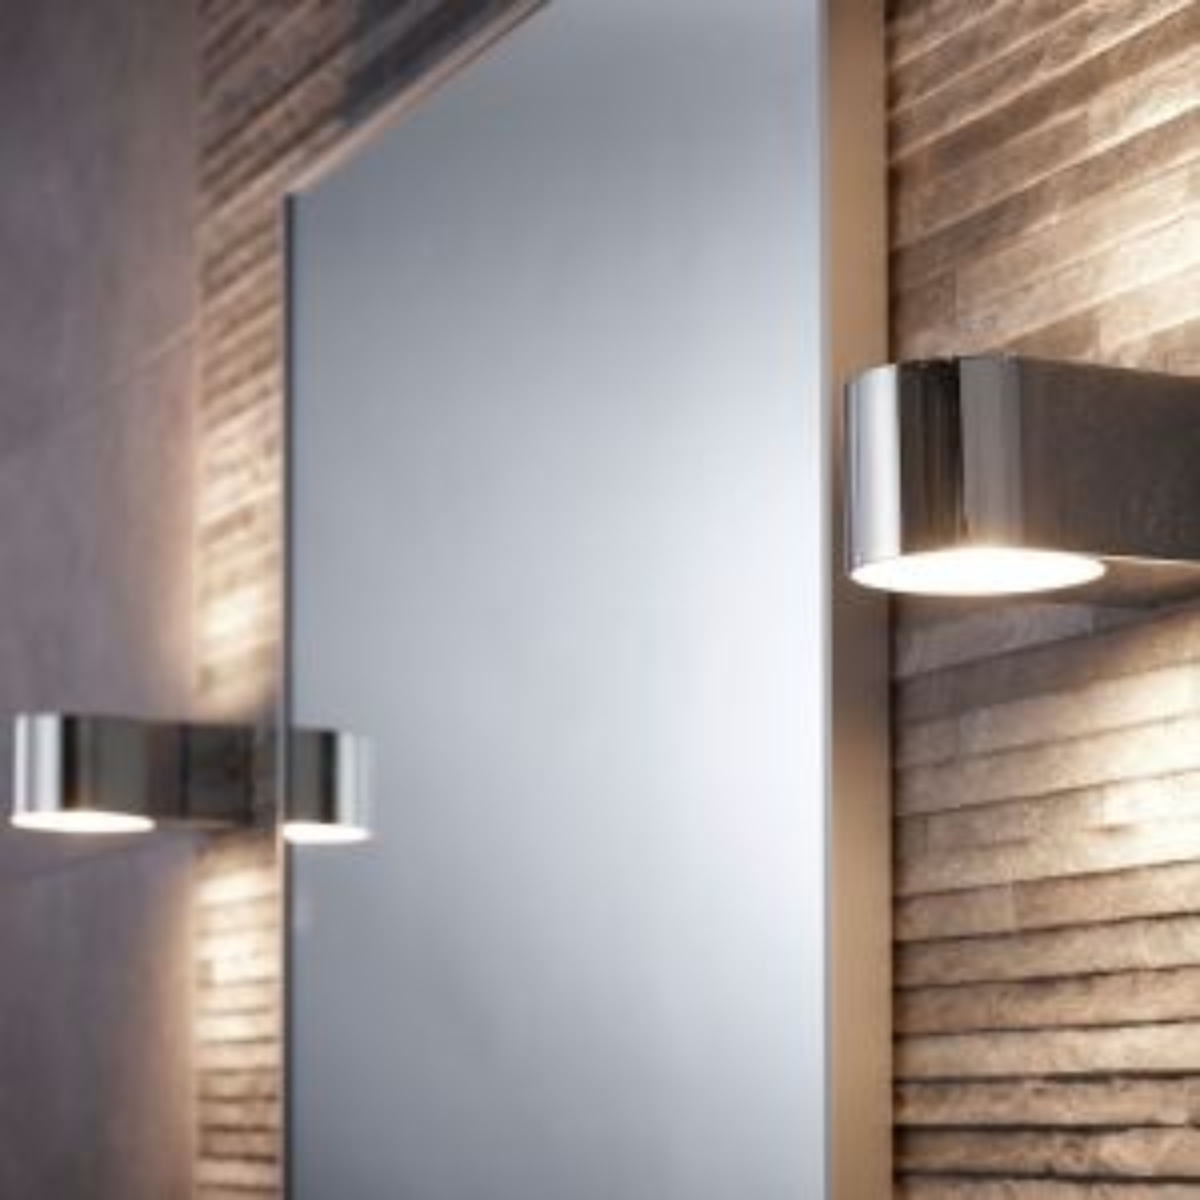 Sensio Madison LED Up/Down Wall Light Lifestyle